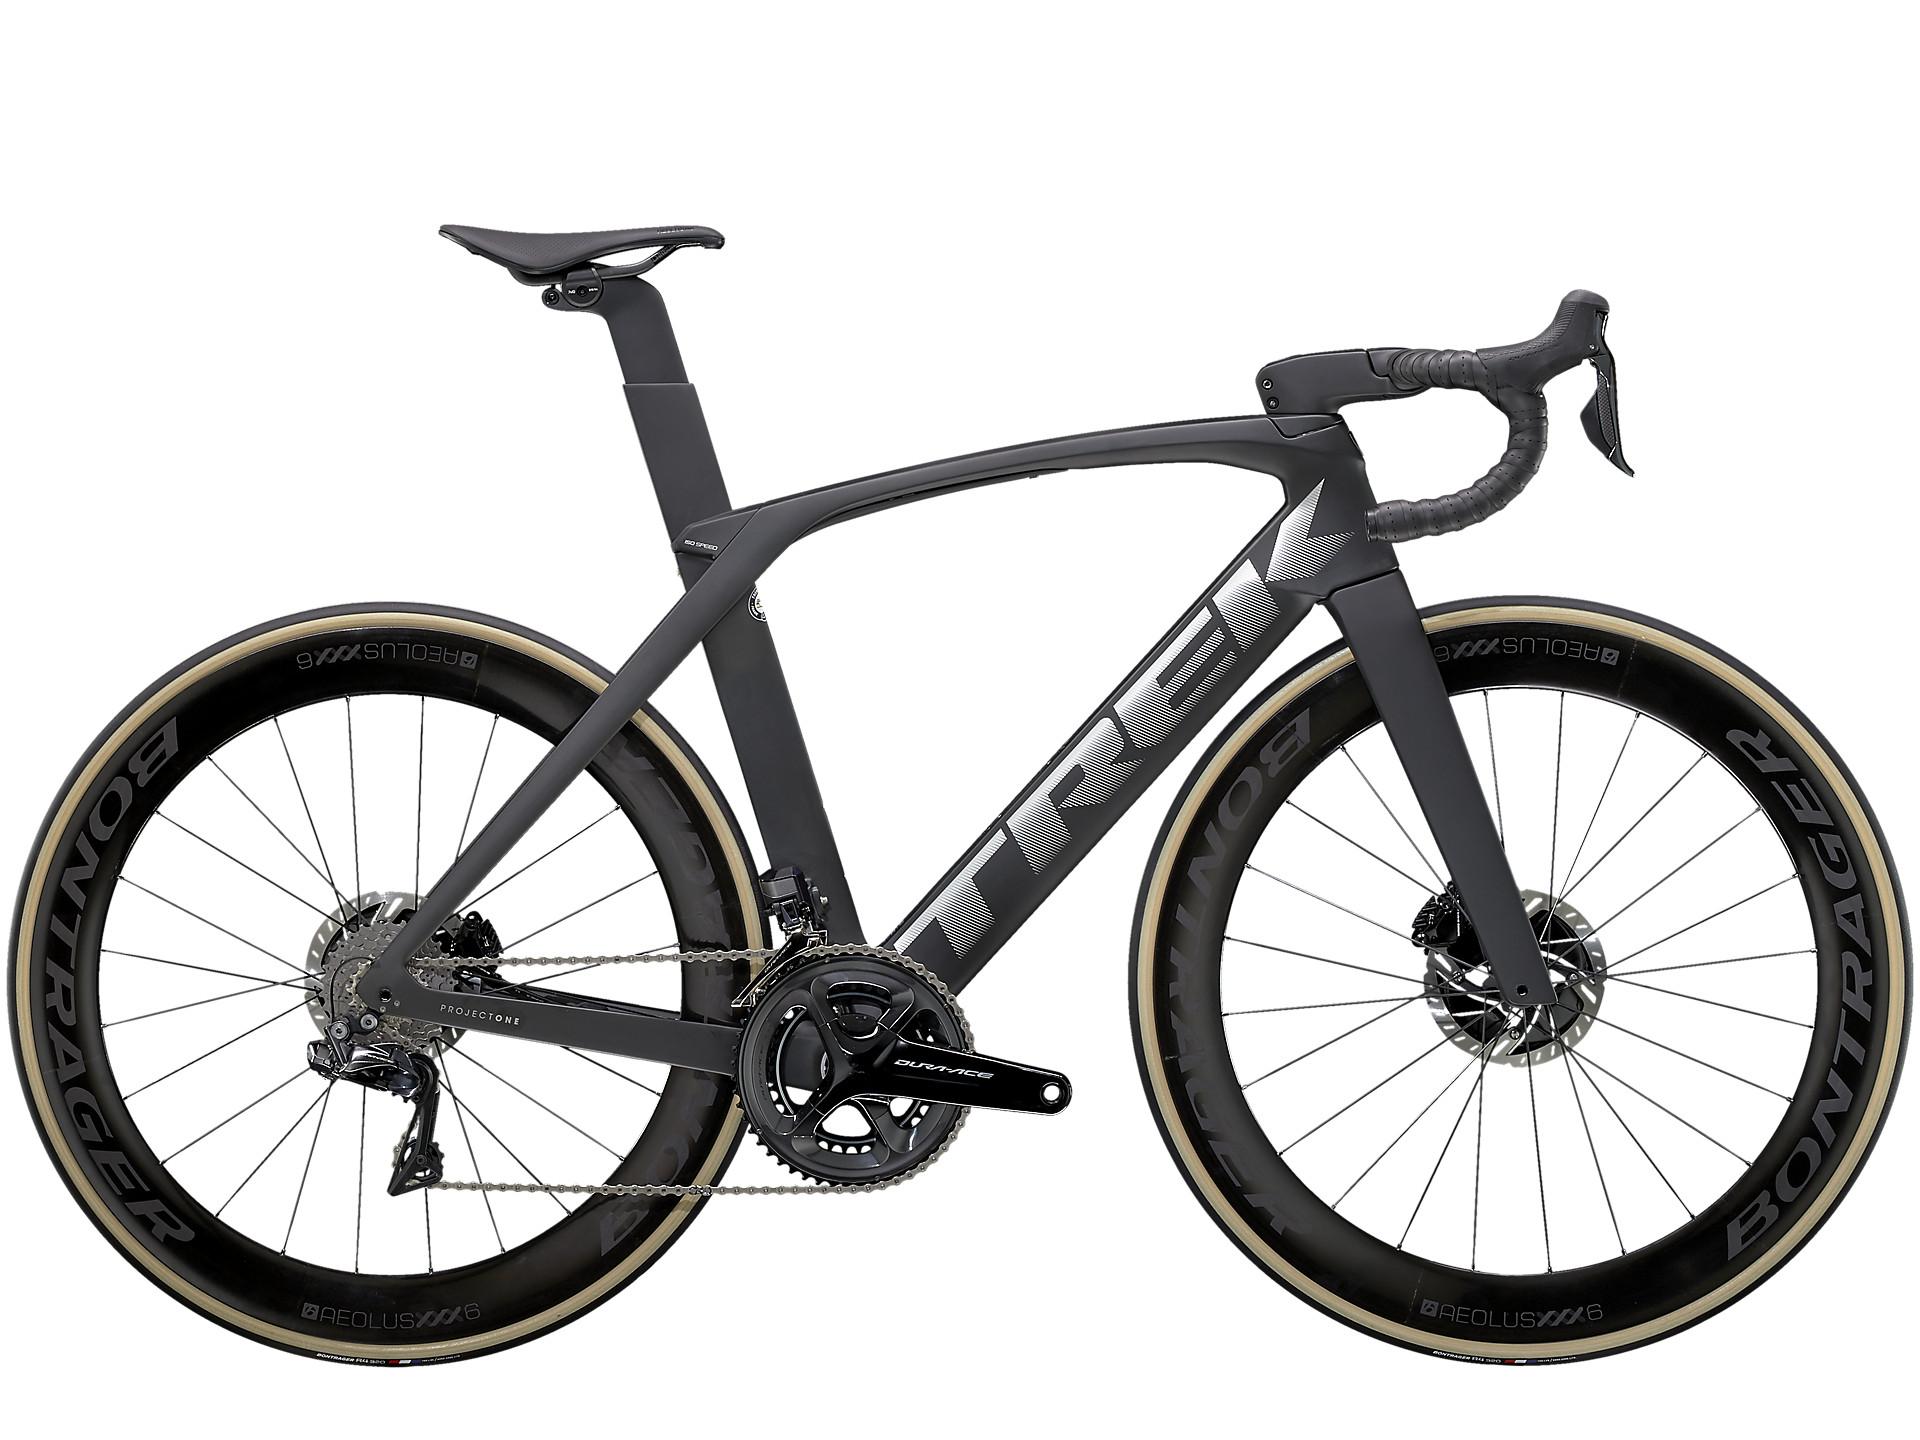 Trek Madone 2021 SLR9 road bike in black